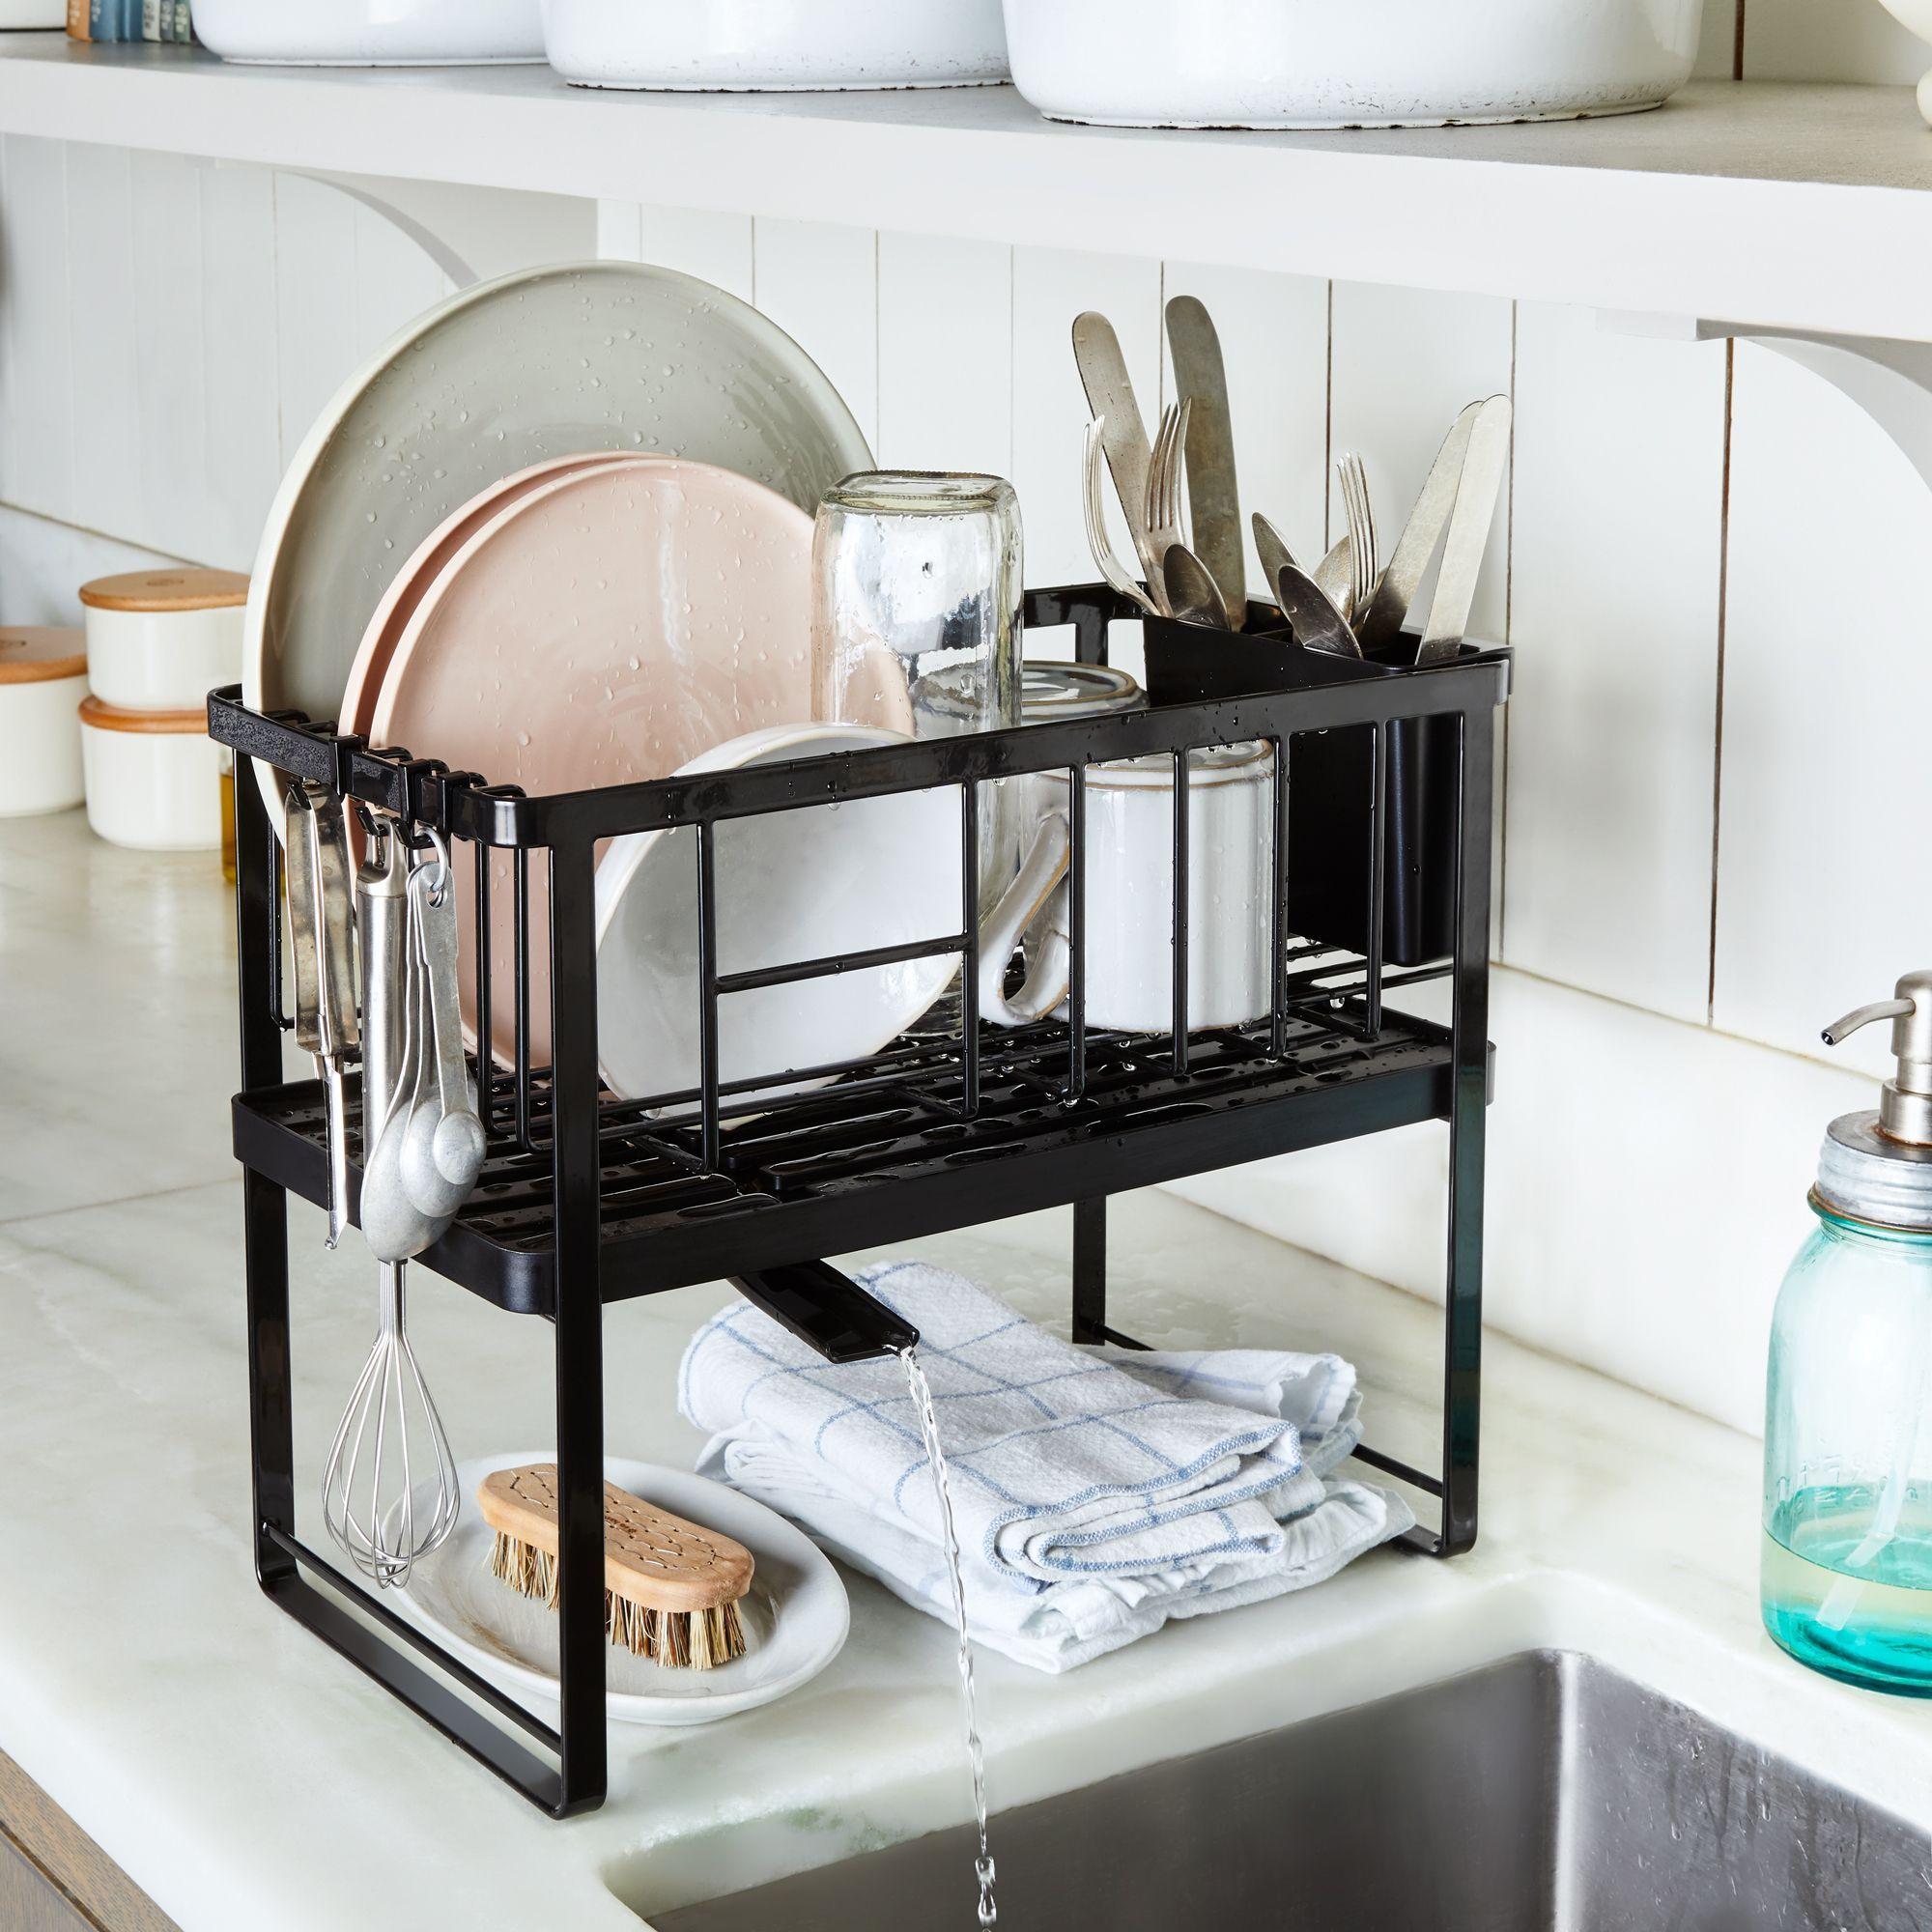 Double Decker Dish Rack Kitchen Design Small Small Kitchen Kitchen Decor